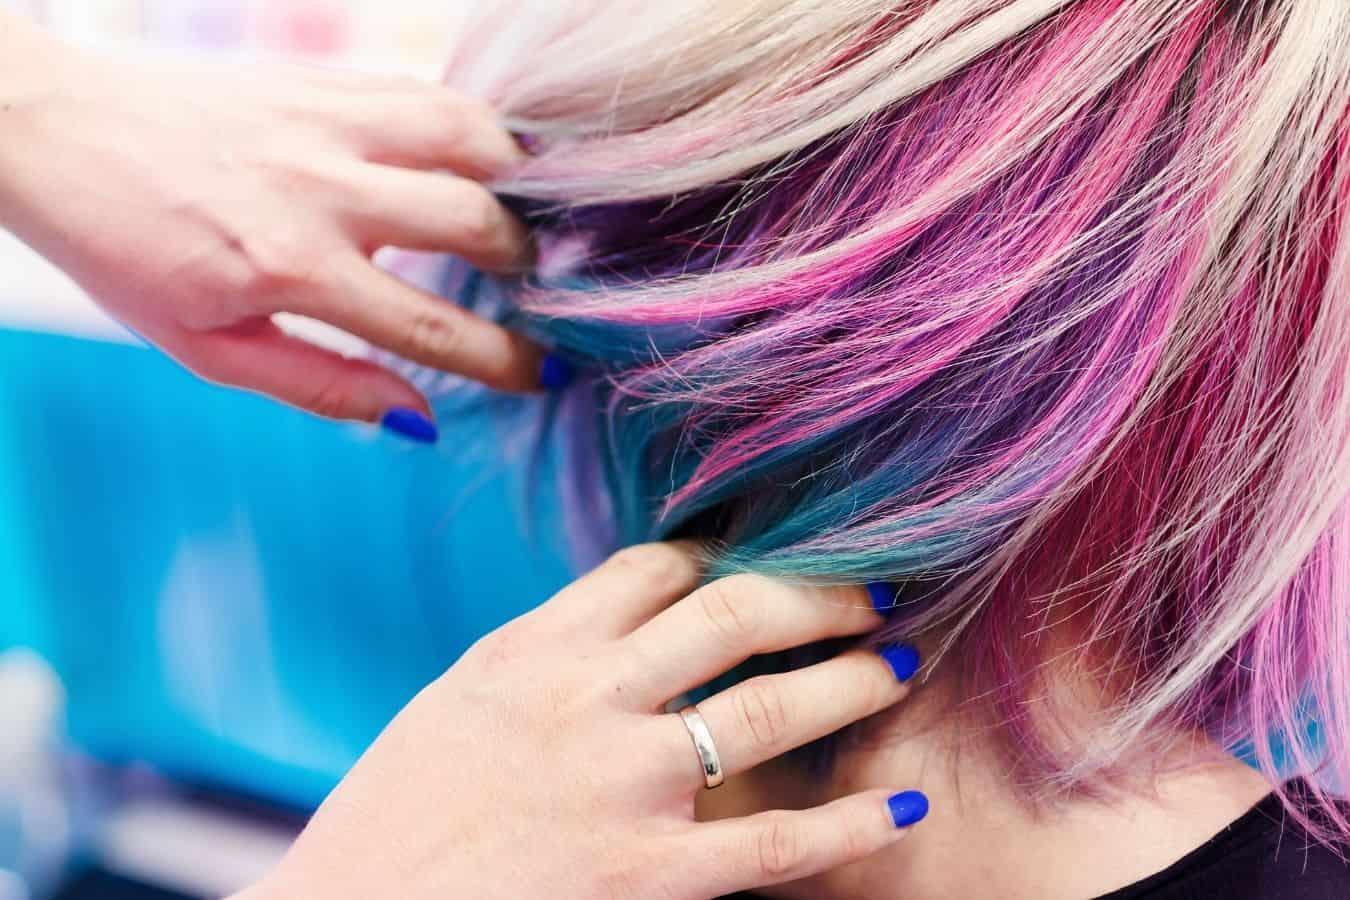 hair dye for keratin treated hair